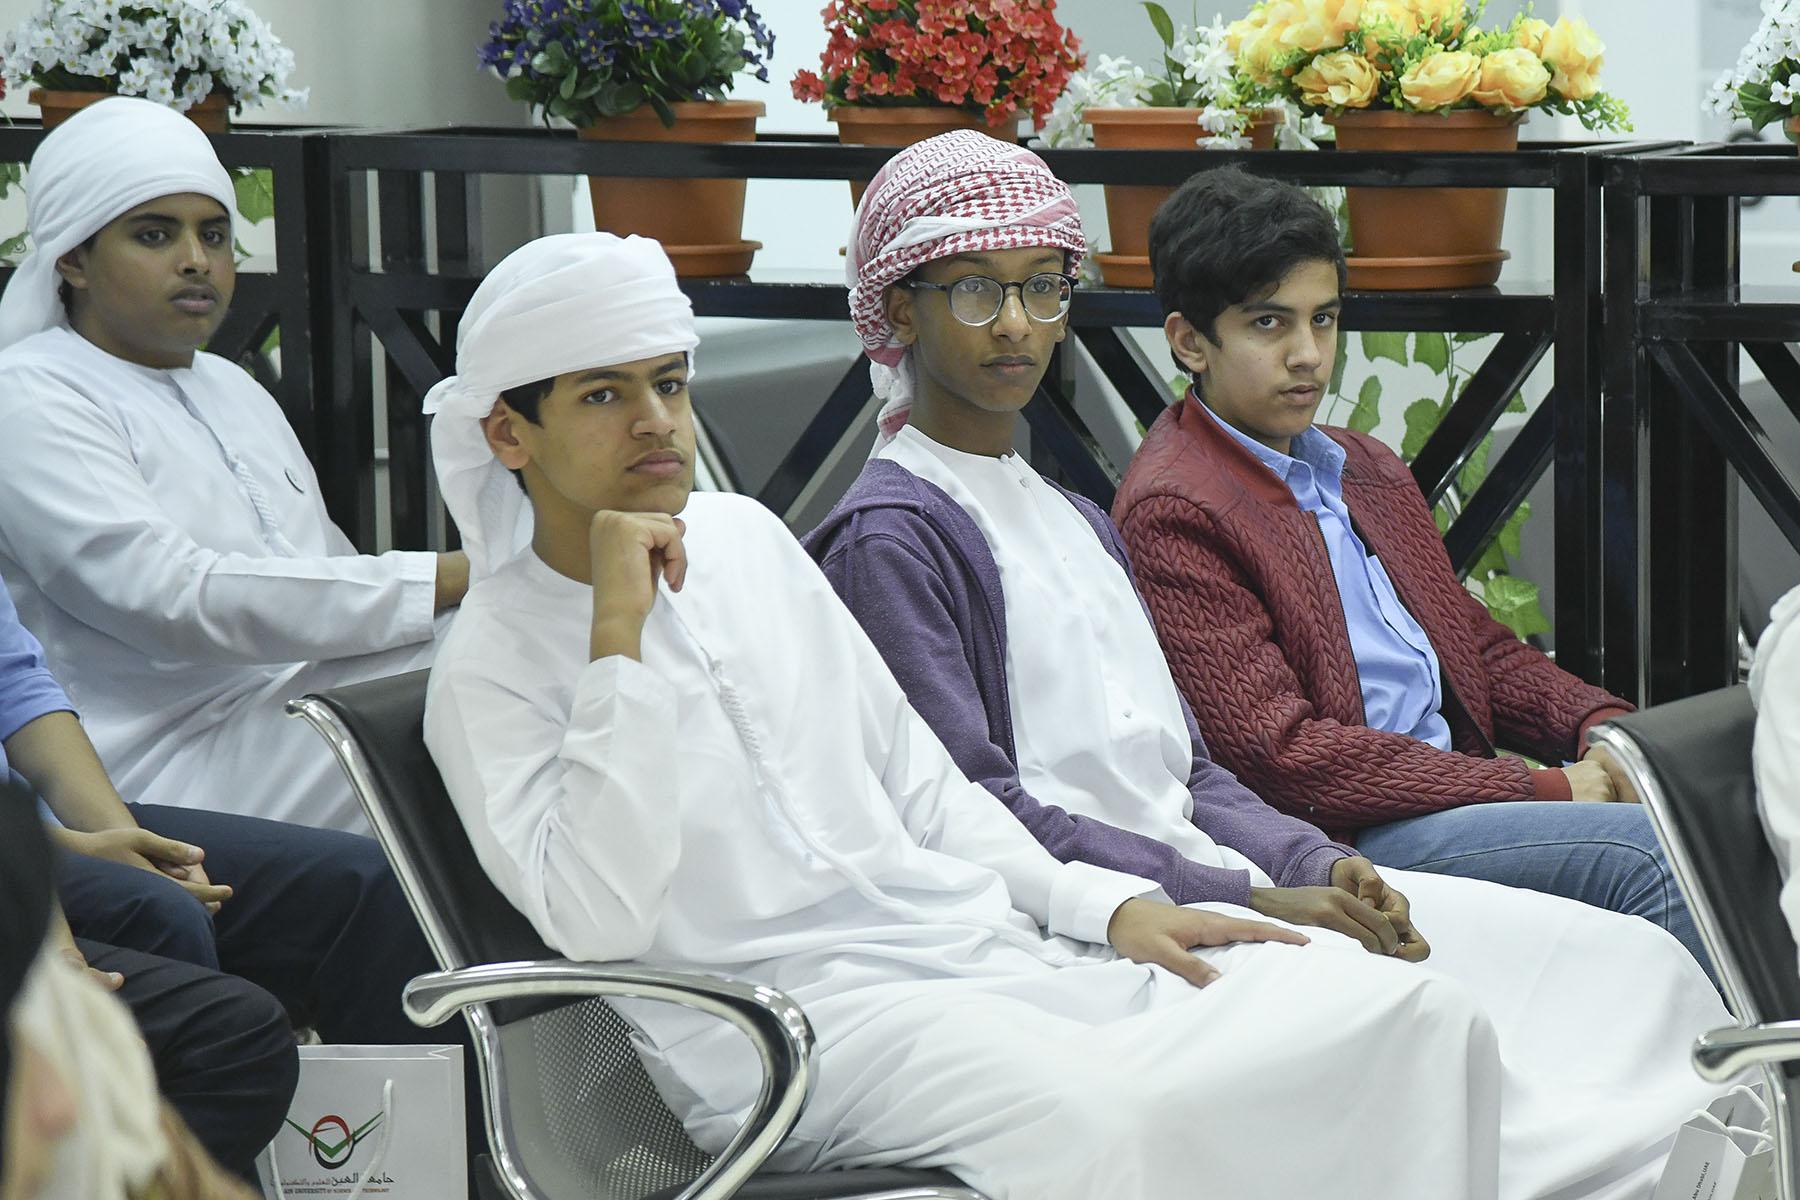 Sixth Day (Dar Al Uloom Private SchoolVS Ibn Khaldun Islamic Private School)